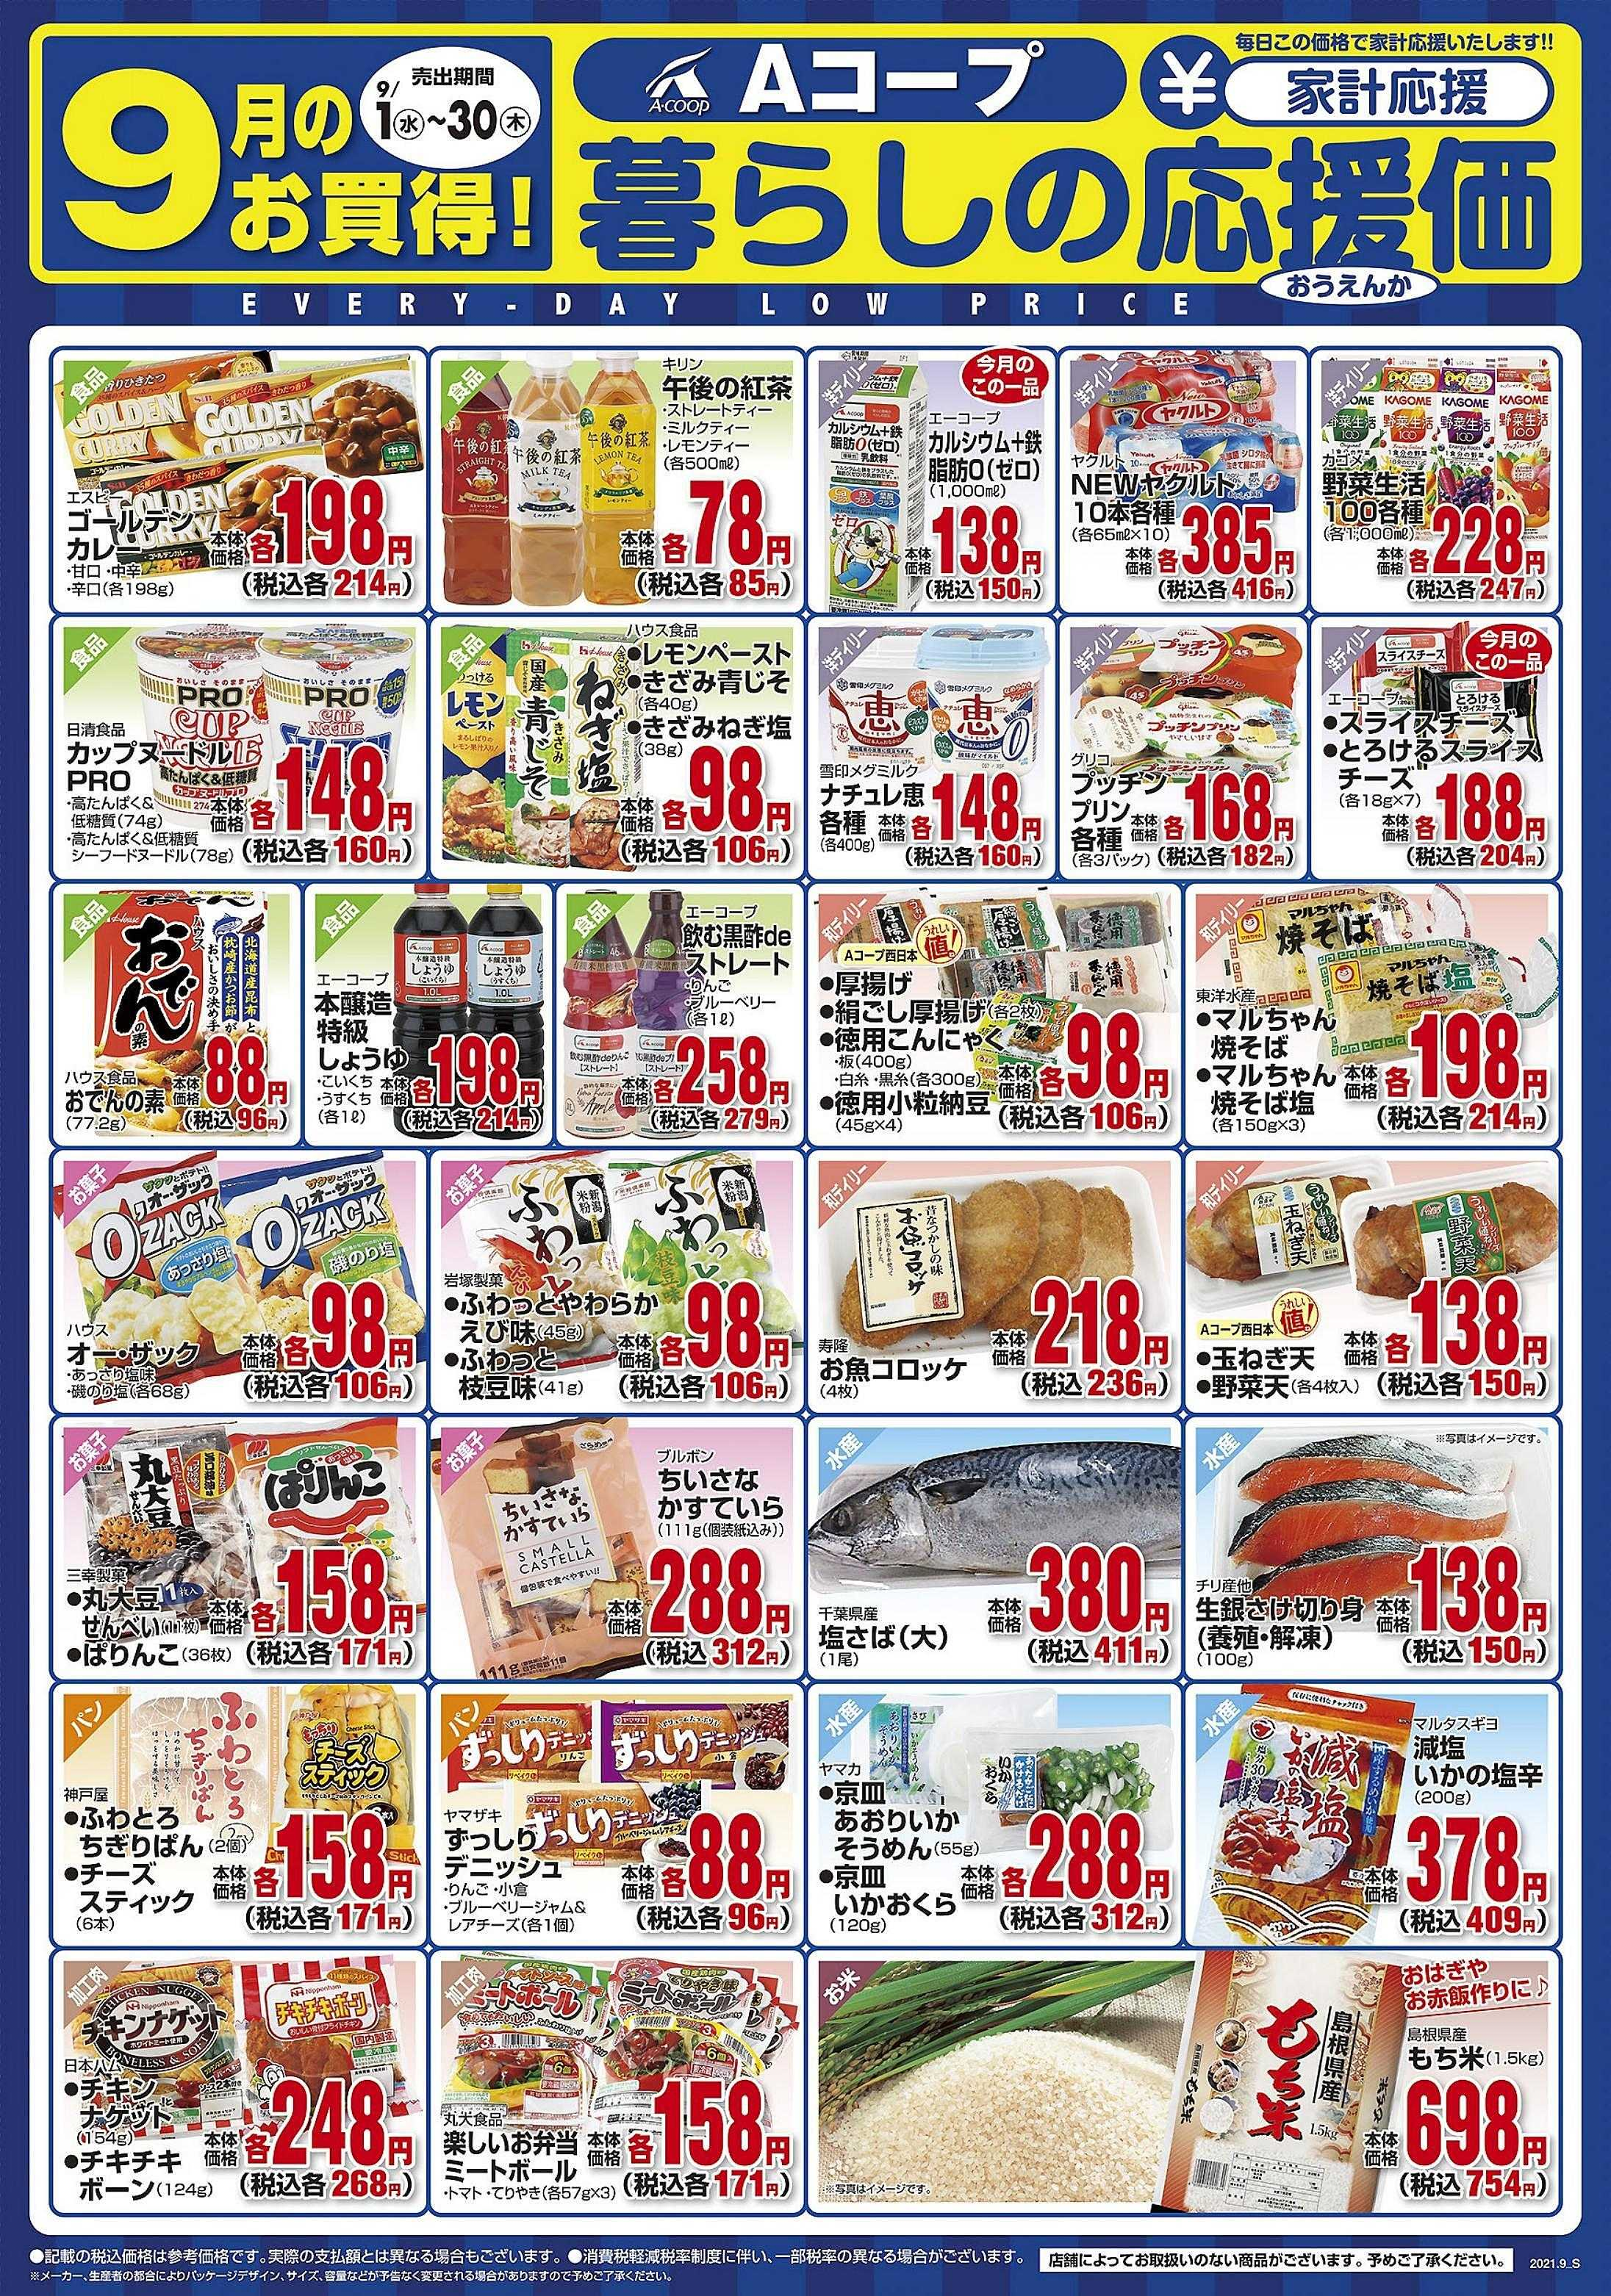 Aコープ西日本 9月「暮らしの応援価」